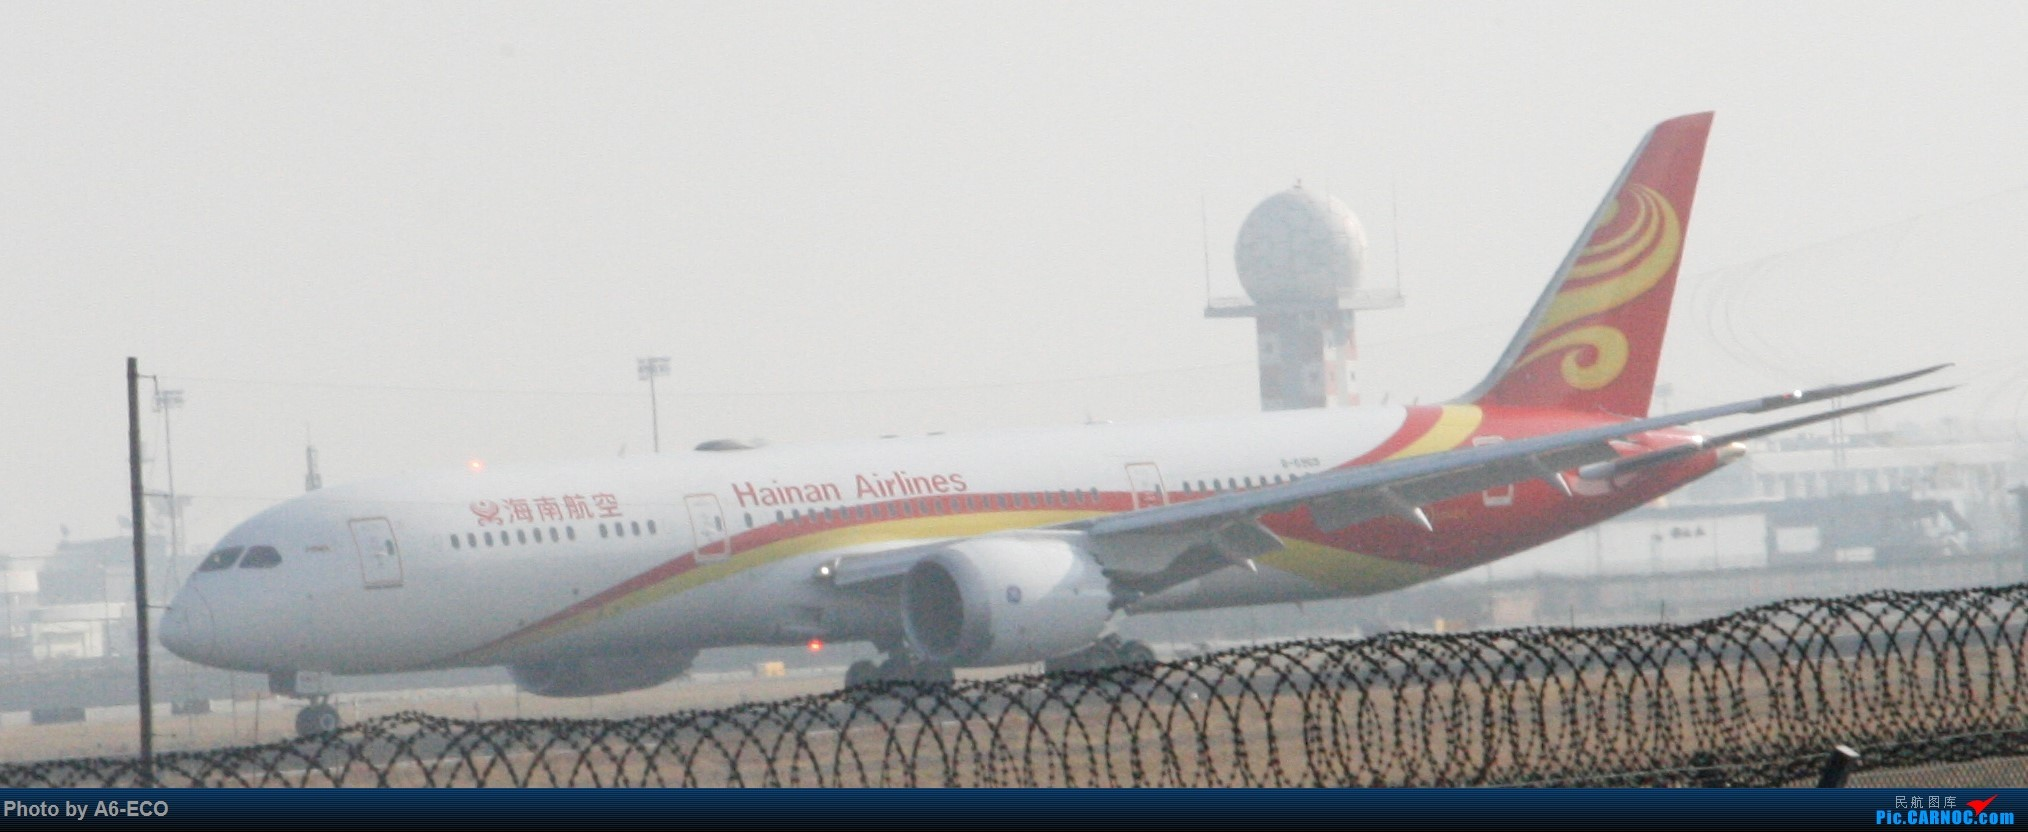 Re:[原创]今天运气极好,云南孔雀,B-1070,2个菜航邮戳,泡菜航彩绘,东航邮戳...... BOEING 787-9 未知 中国北京首都国际机场